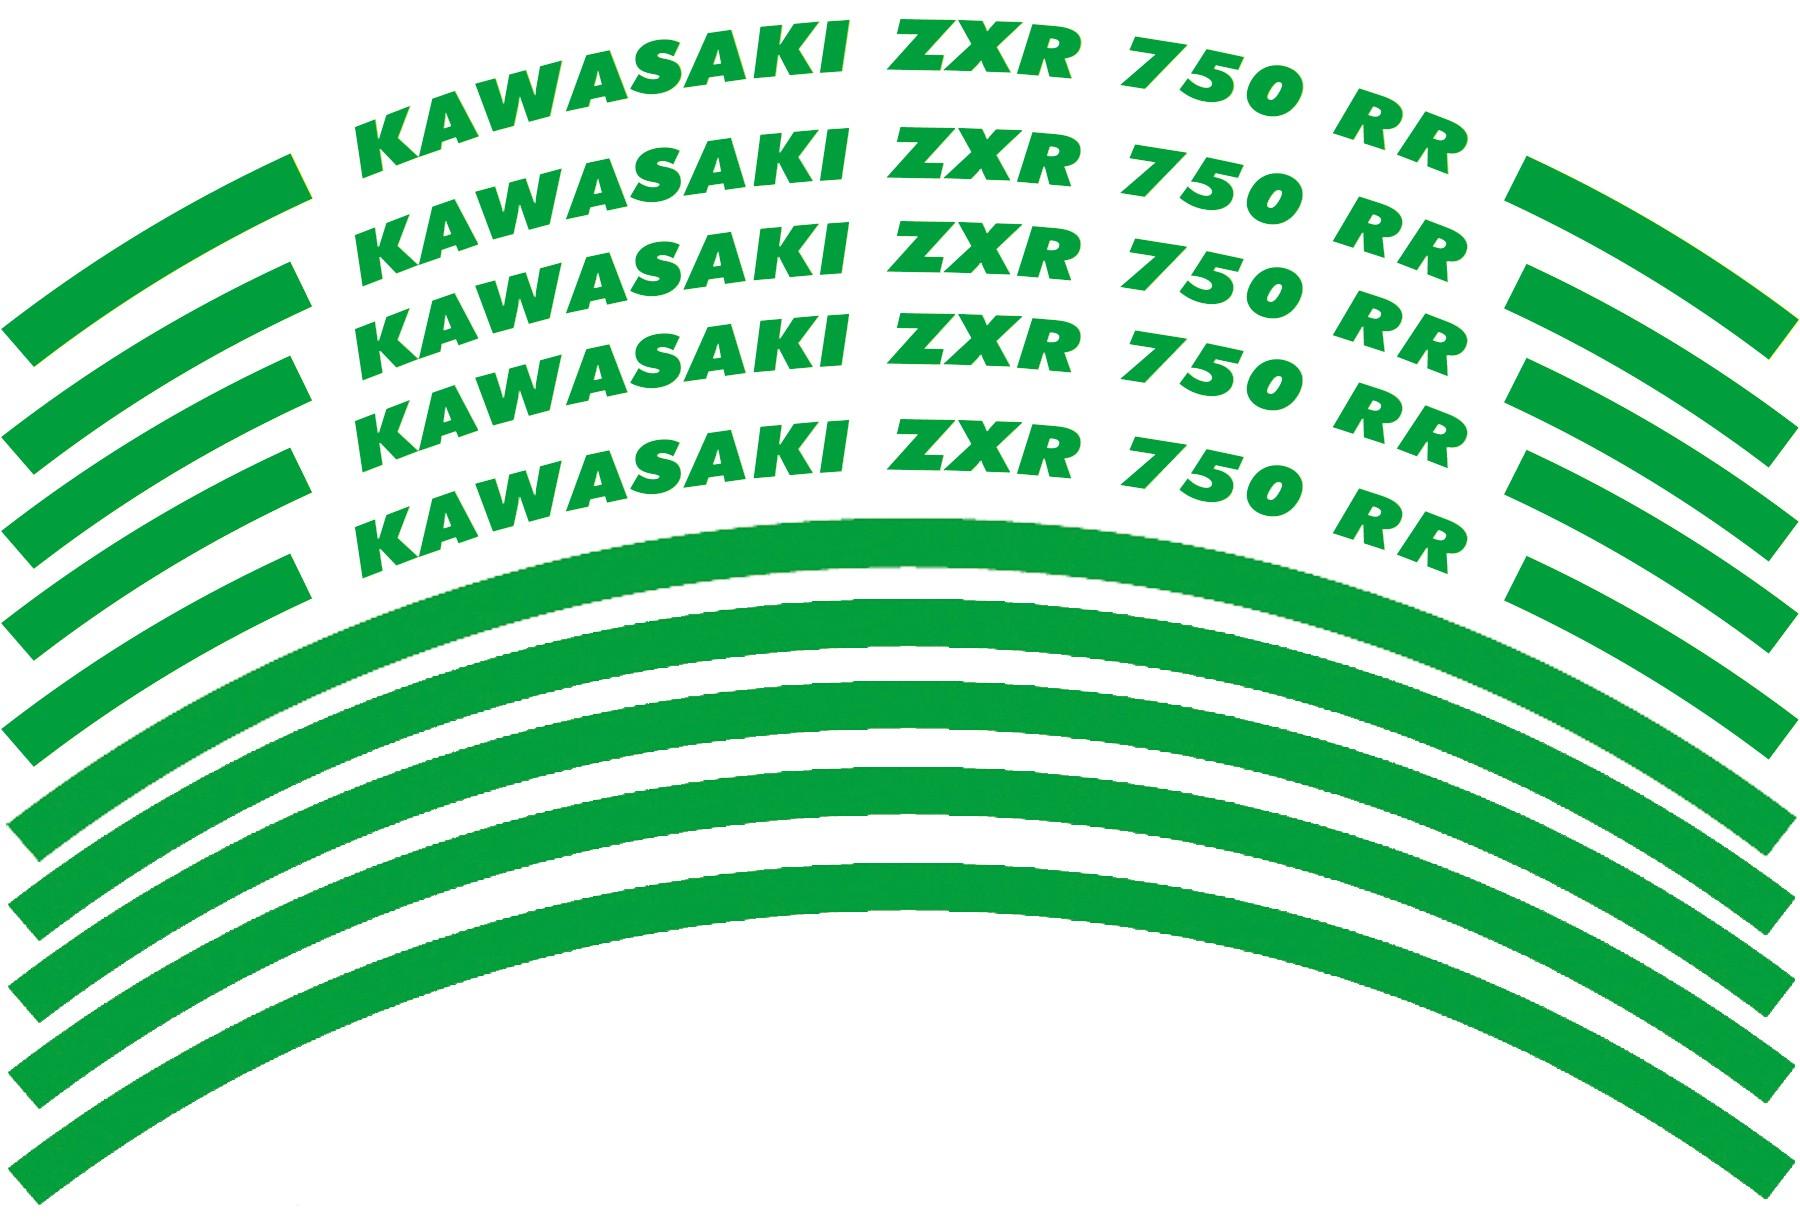 Felgenrandaufkleber Kawasaki ZXR 750 RR Grün